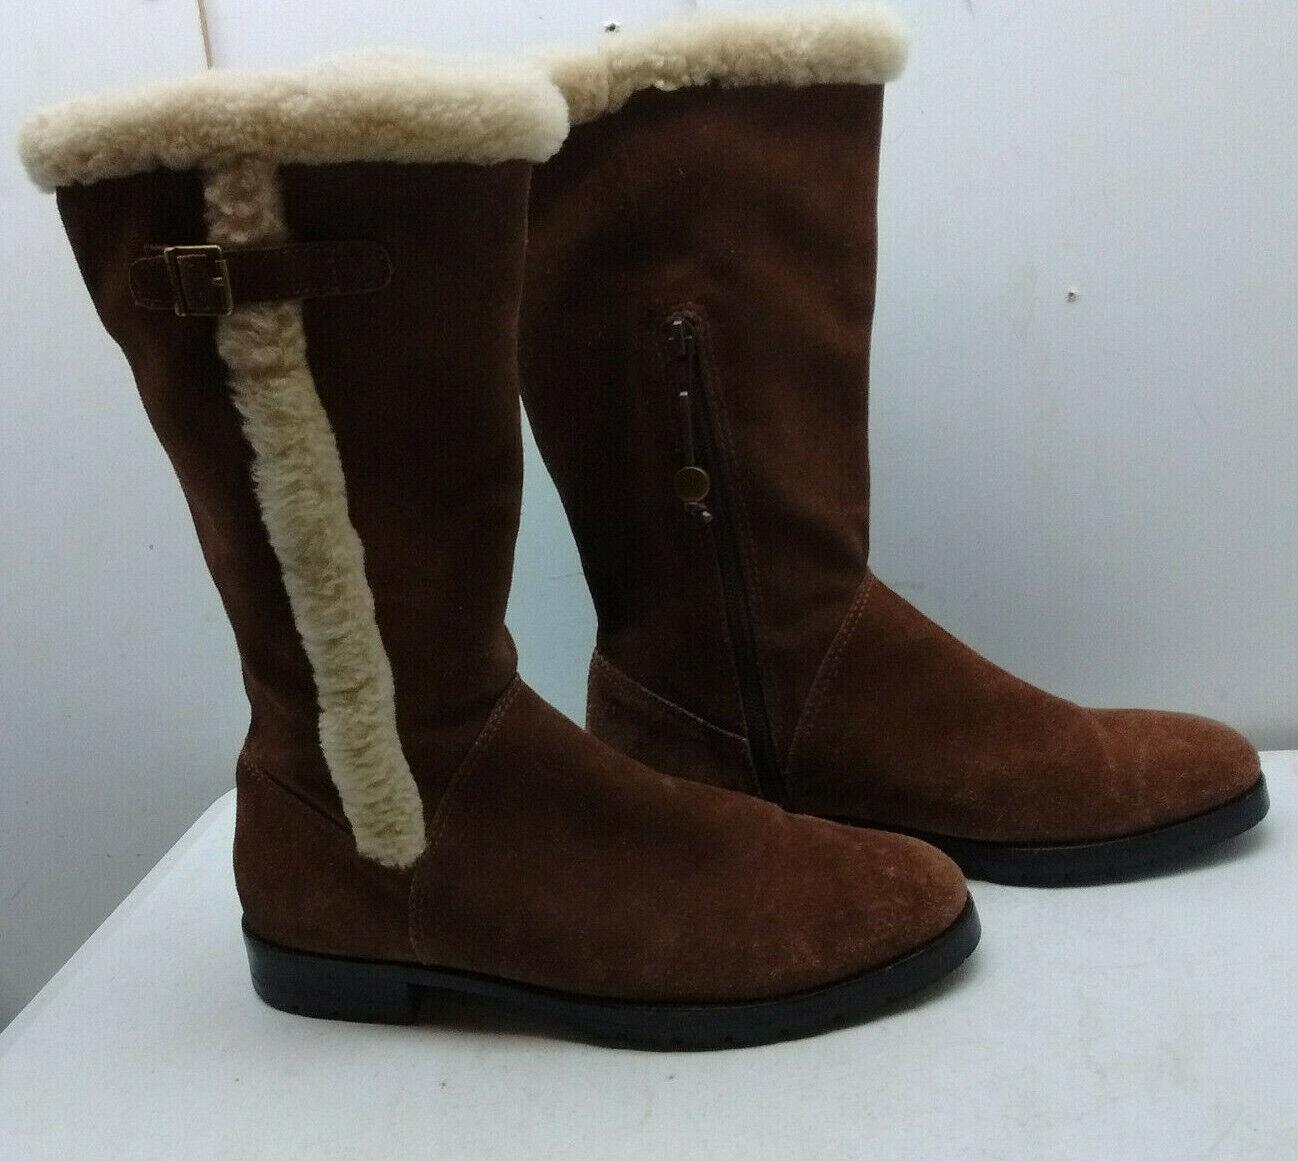 molte concessioni Ralph Ralph Ralph Lauren Marrone Suede Mid Calf Tall Zip Buckle Winter avvio Donna  scarpe 9.5B  Felice shopping